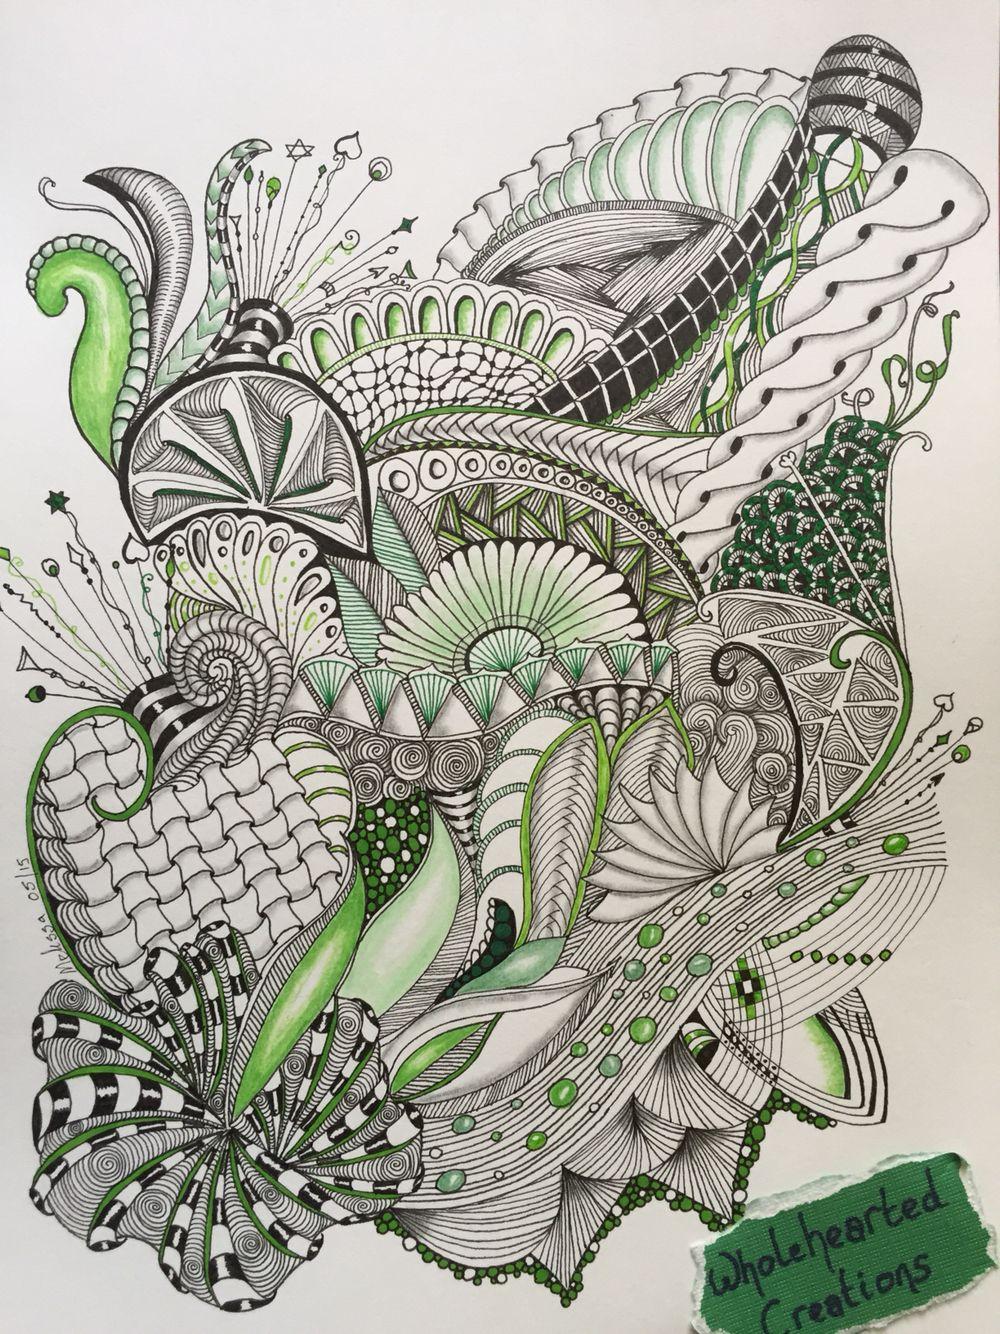 Zen doodle colour - Zia Zentangle Zendoodle Zenspiration Dangles Doodle Colour Green Aquafleur Cadent Funnls Intwine Shattuck Oringel Ribbons Flower